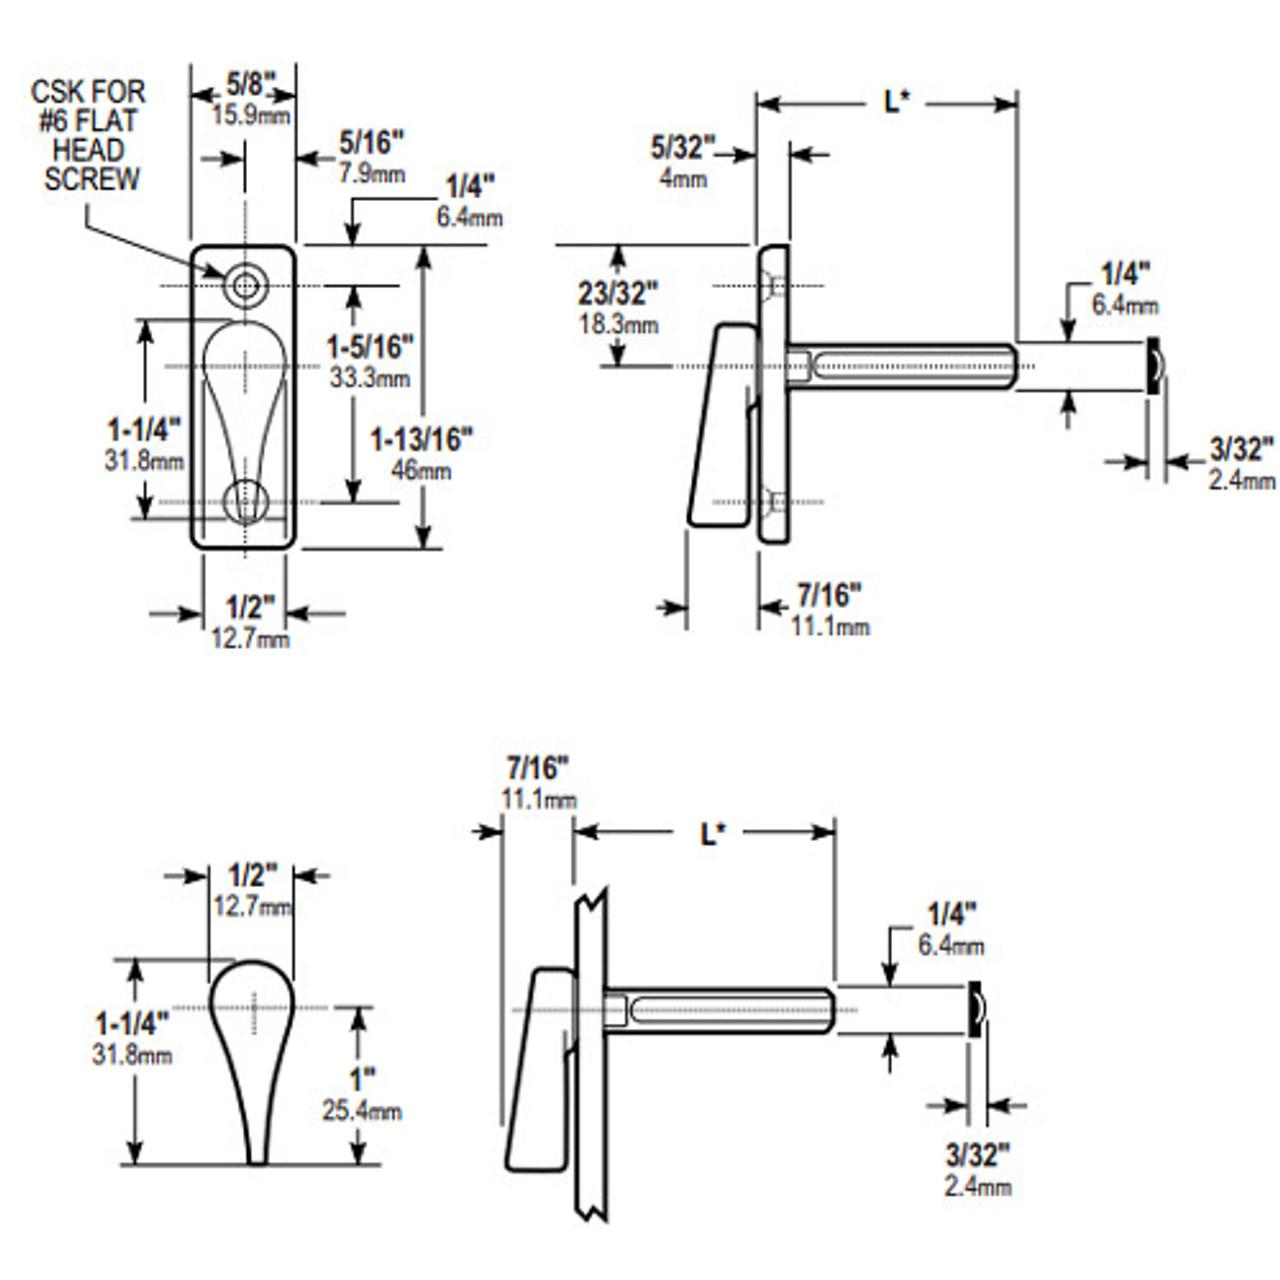 1000-02-17-119 Adams Rite 1000 Series Turns Dimensional View